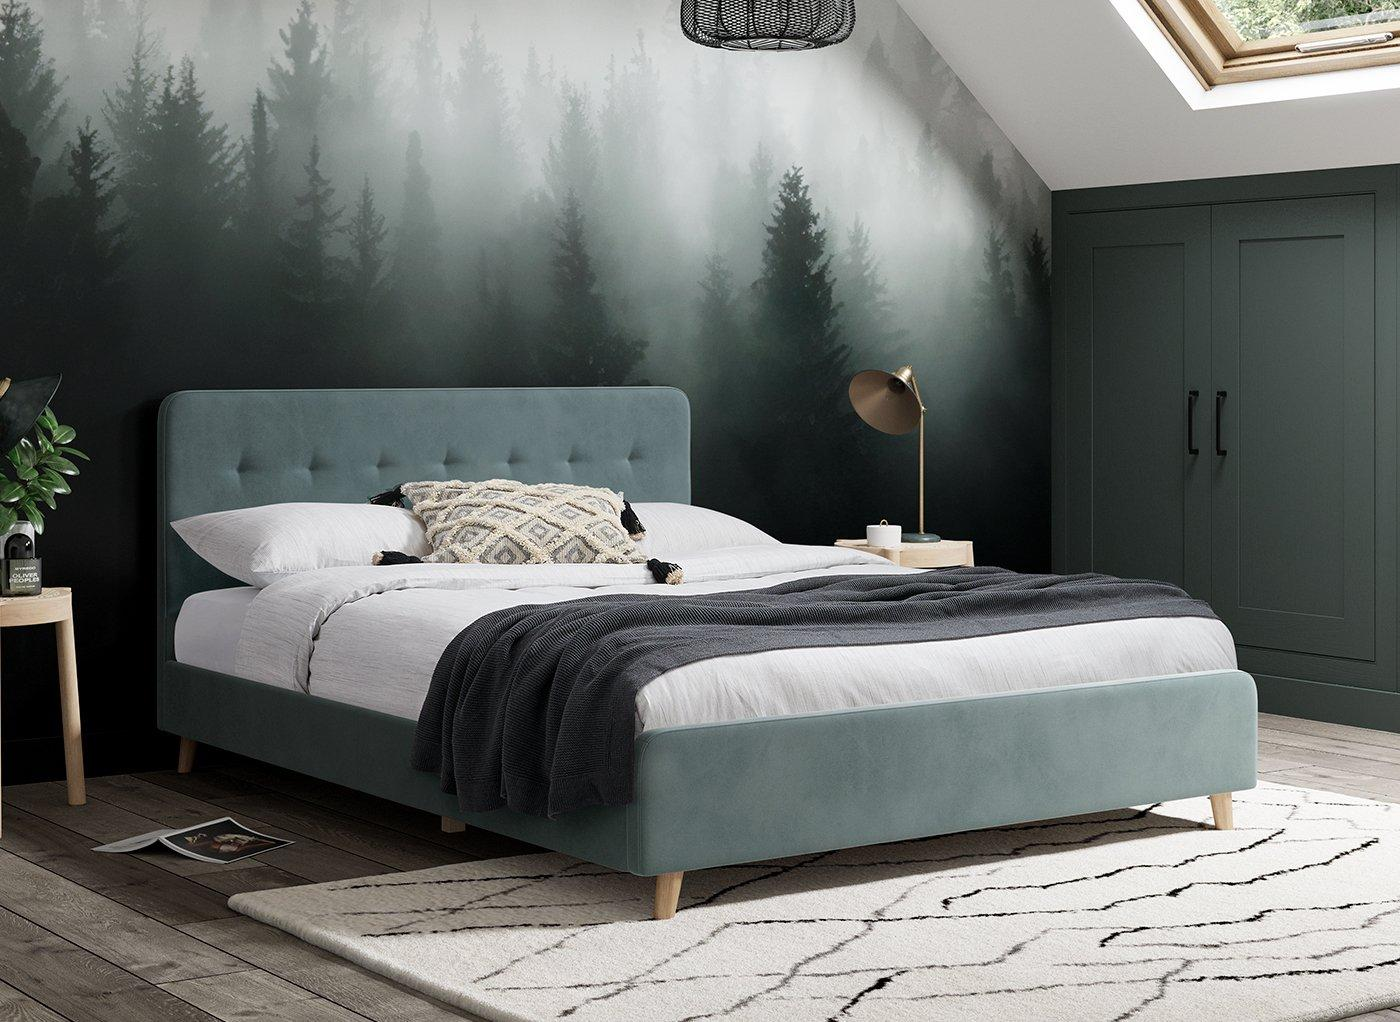 emmerson-upholstered-low-rise-bed-frame